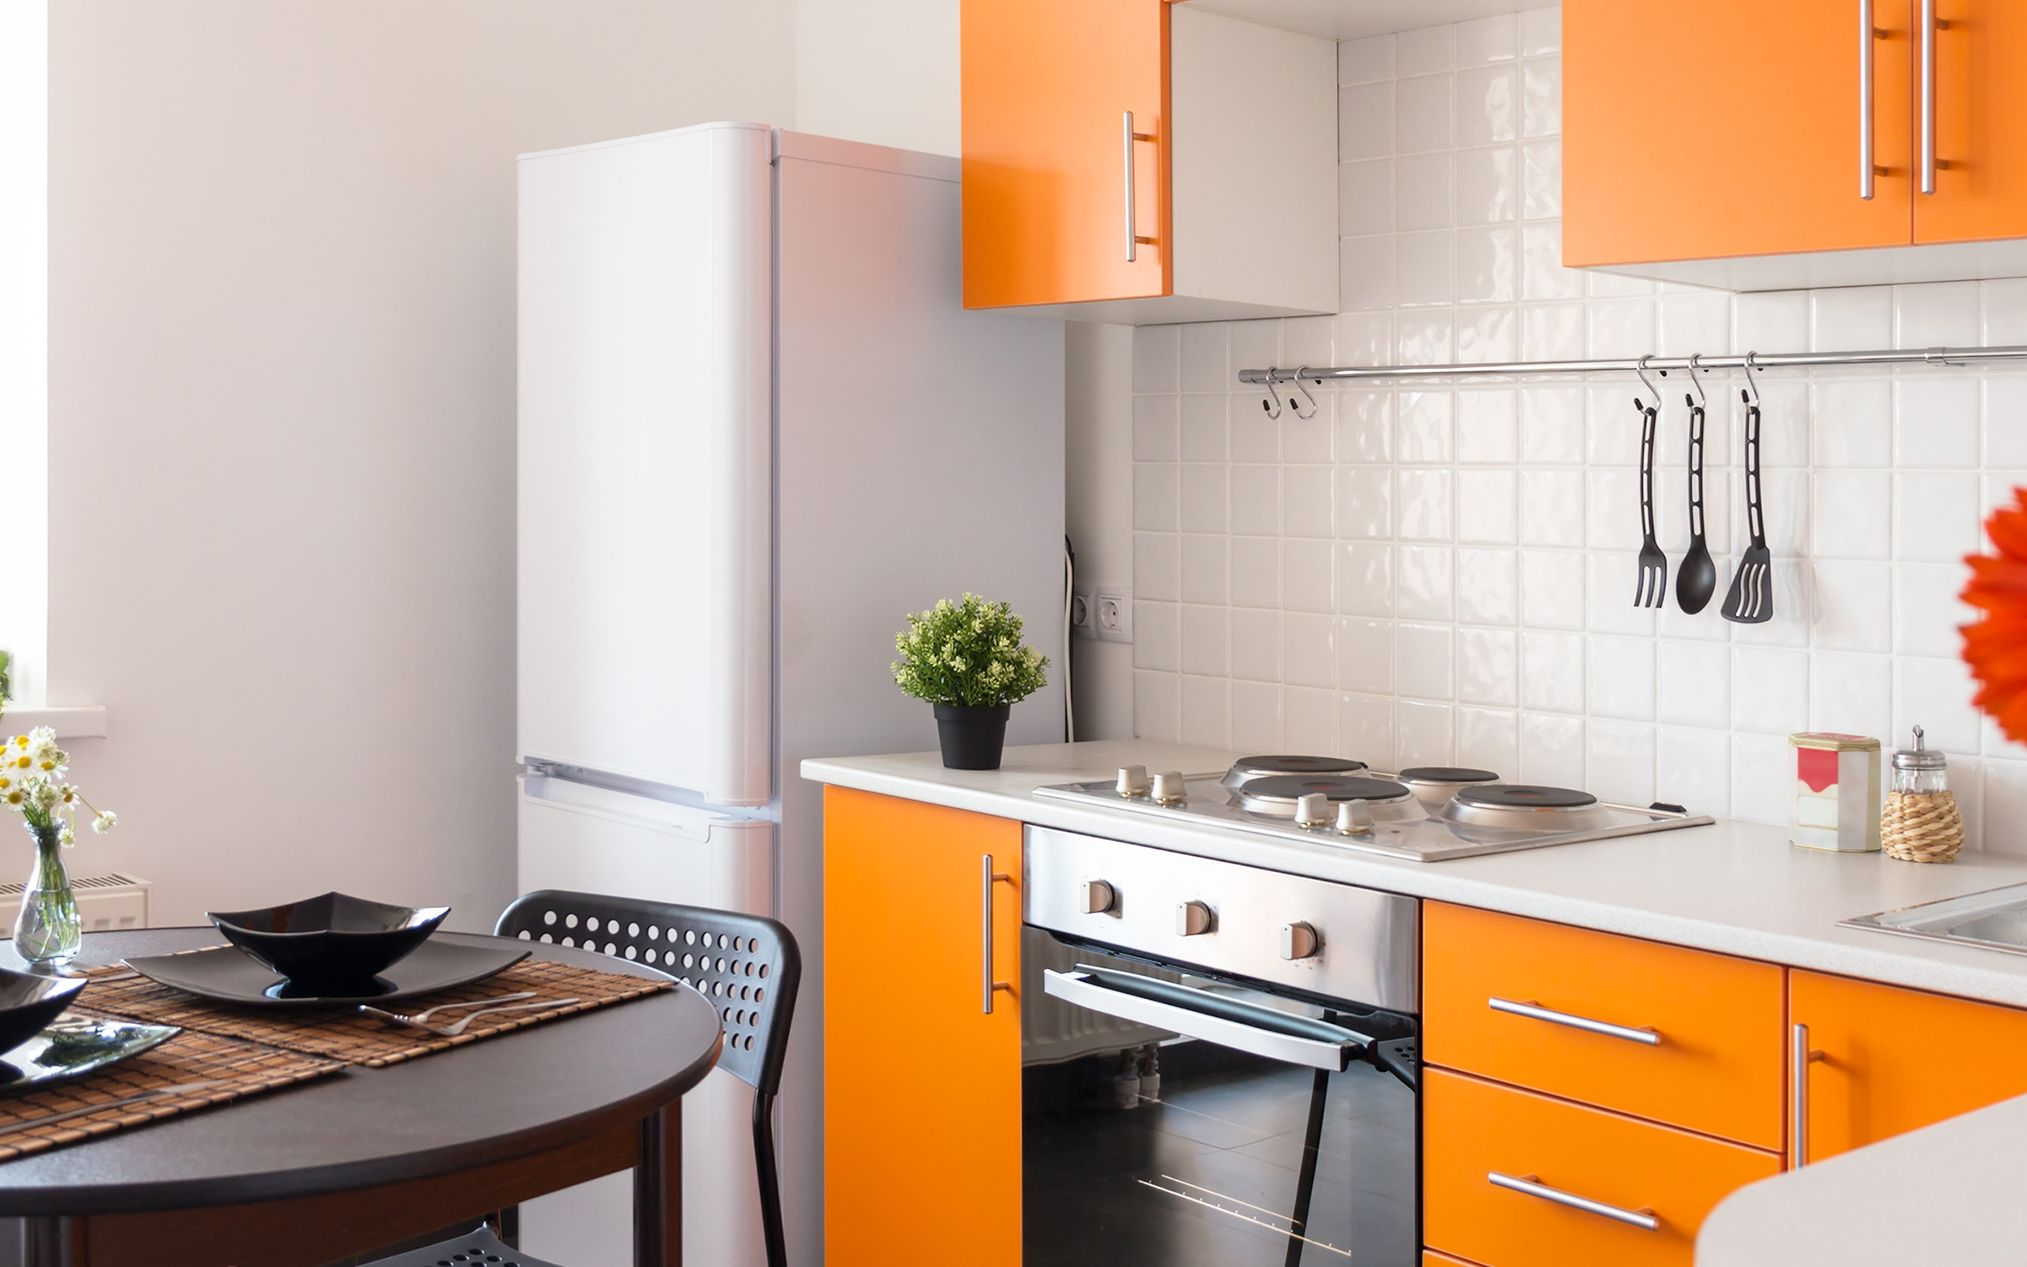 Oransje – årets interiørfarge